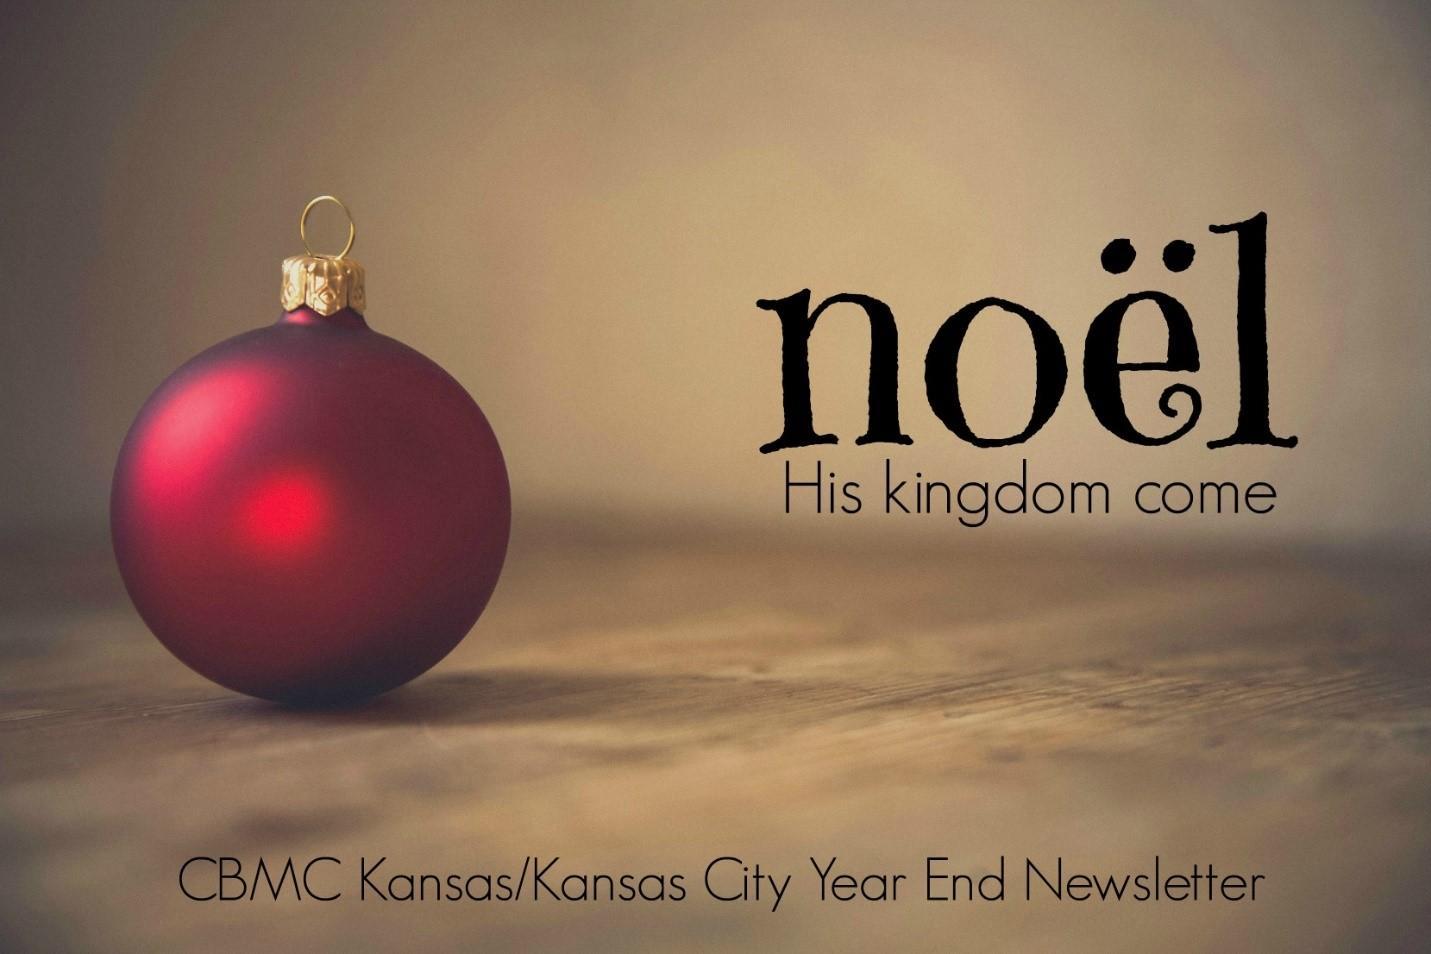 CBMC Kansas / Kansas City Year End Newsletter